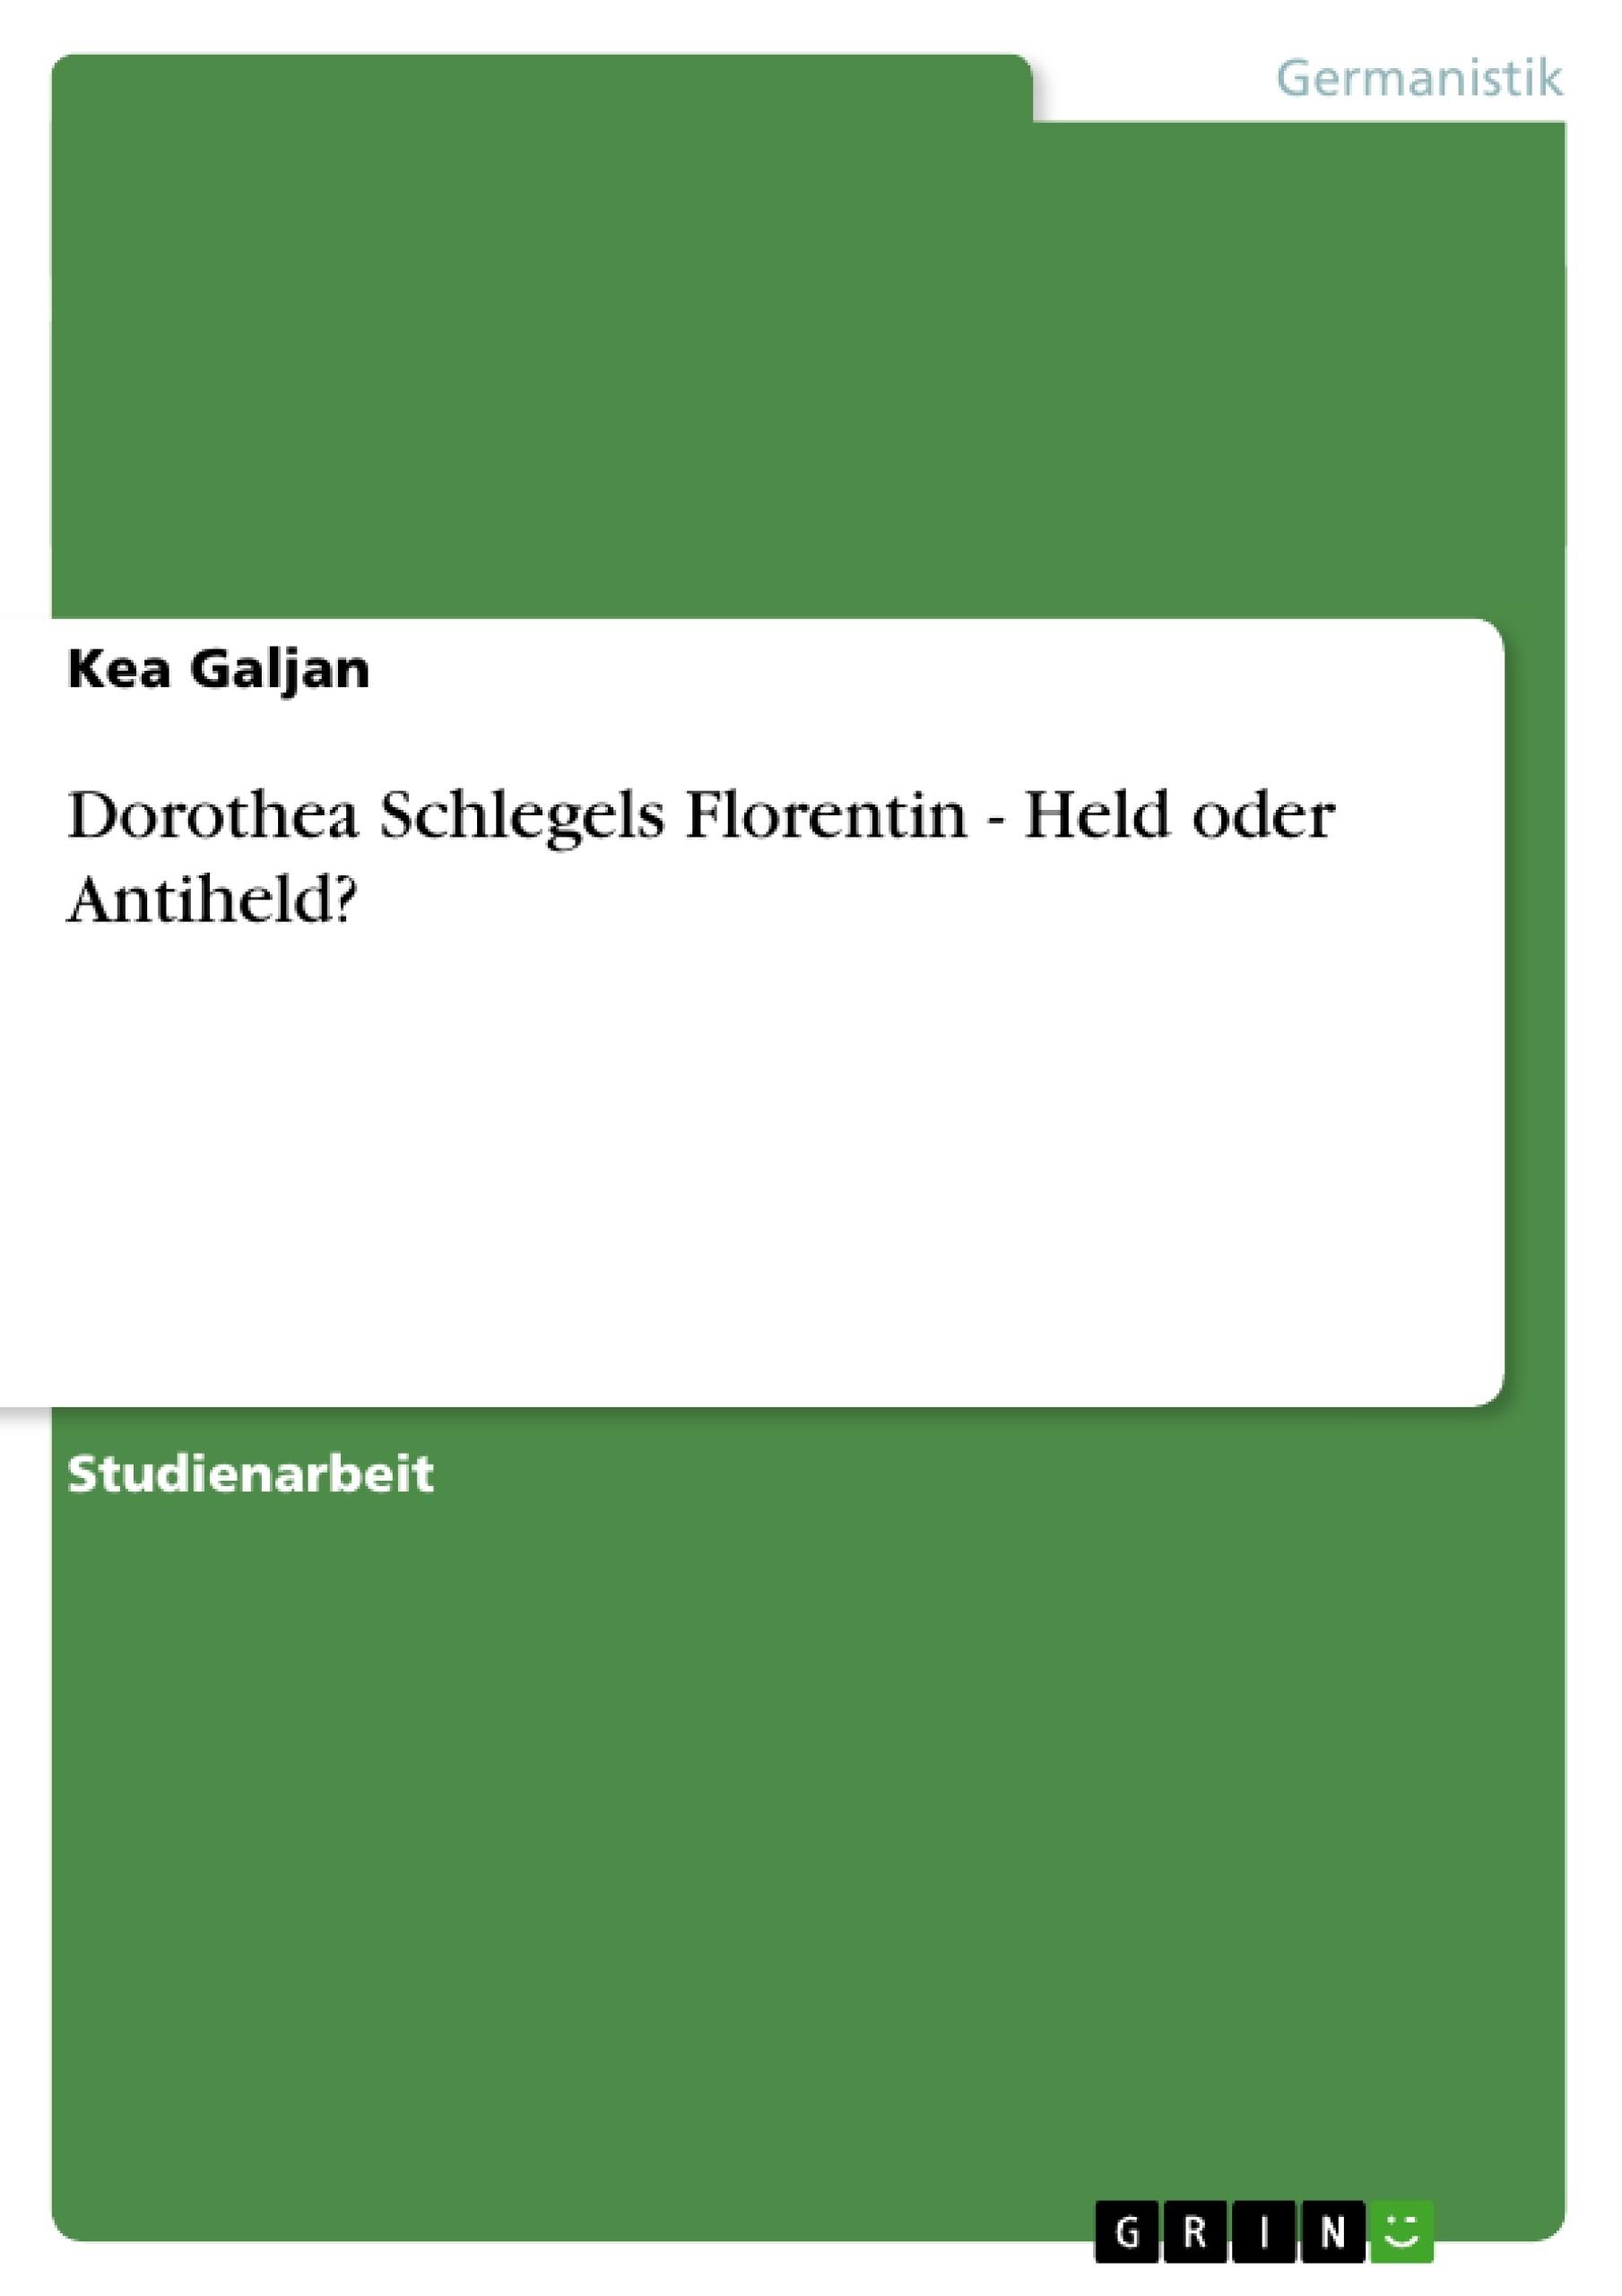 Titel: Dorothea Schlegels Florentin - Held oder Antiheld?